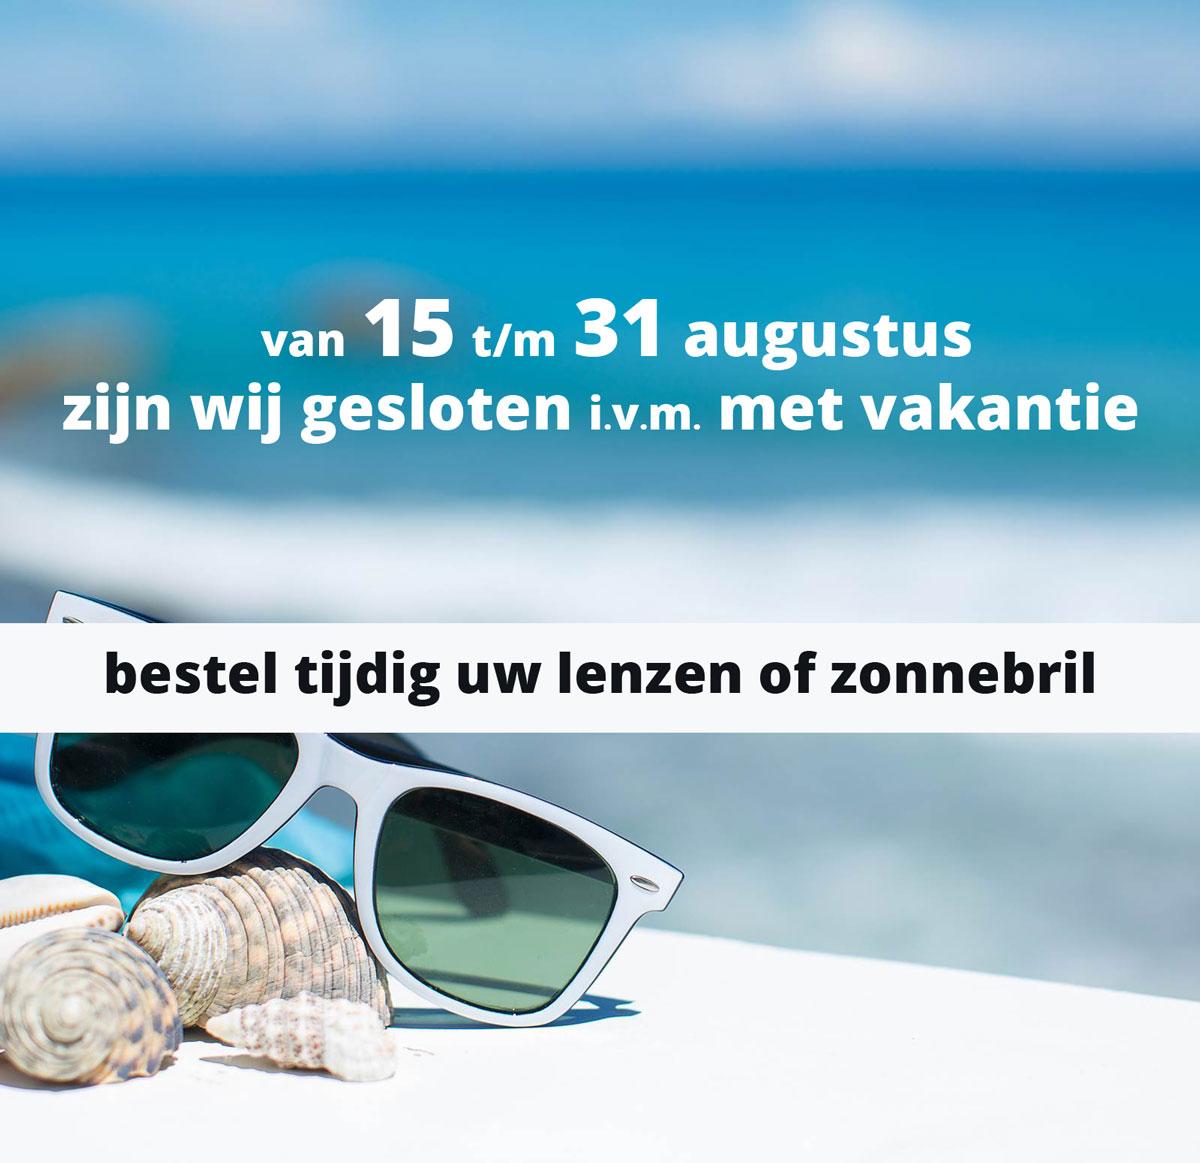 Ook wij gaan met vakantie van  15 augutus t/m 31 augustus